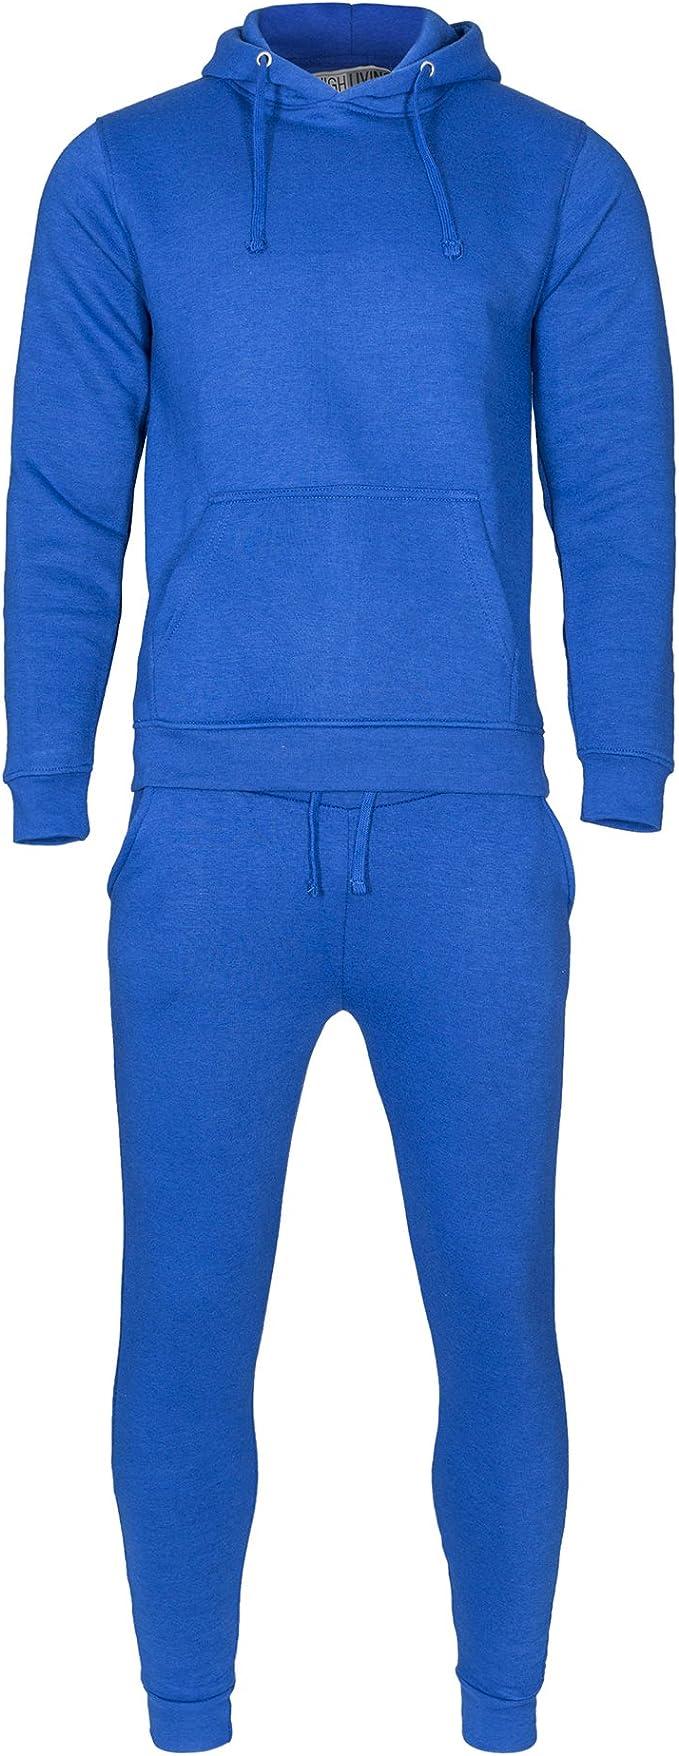 Highliving Unisex Plain Hooded Tracksuit Set Fleece Hoodie Top Bottoms Jogging Joggers Gym